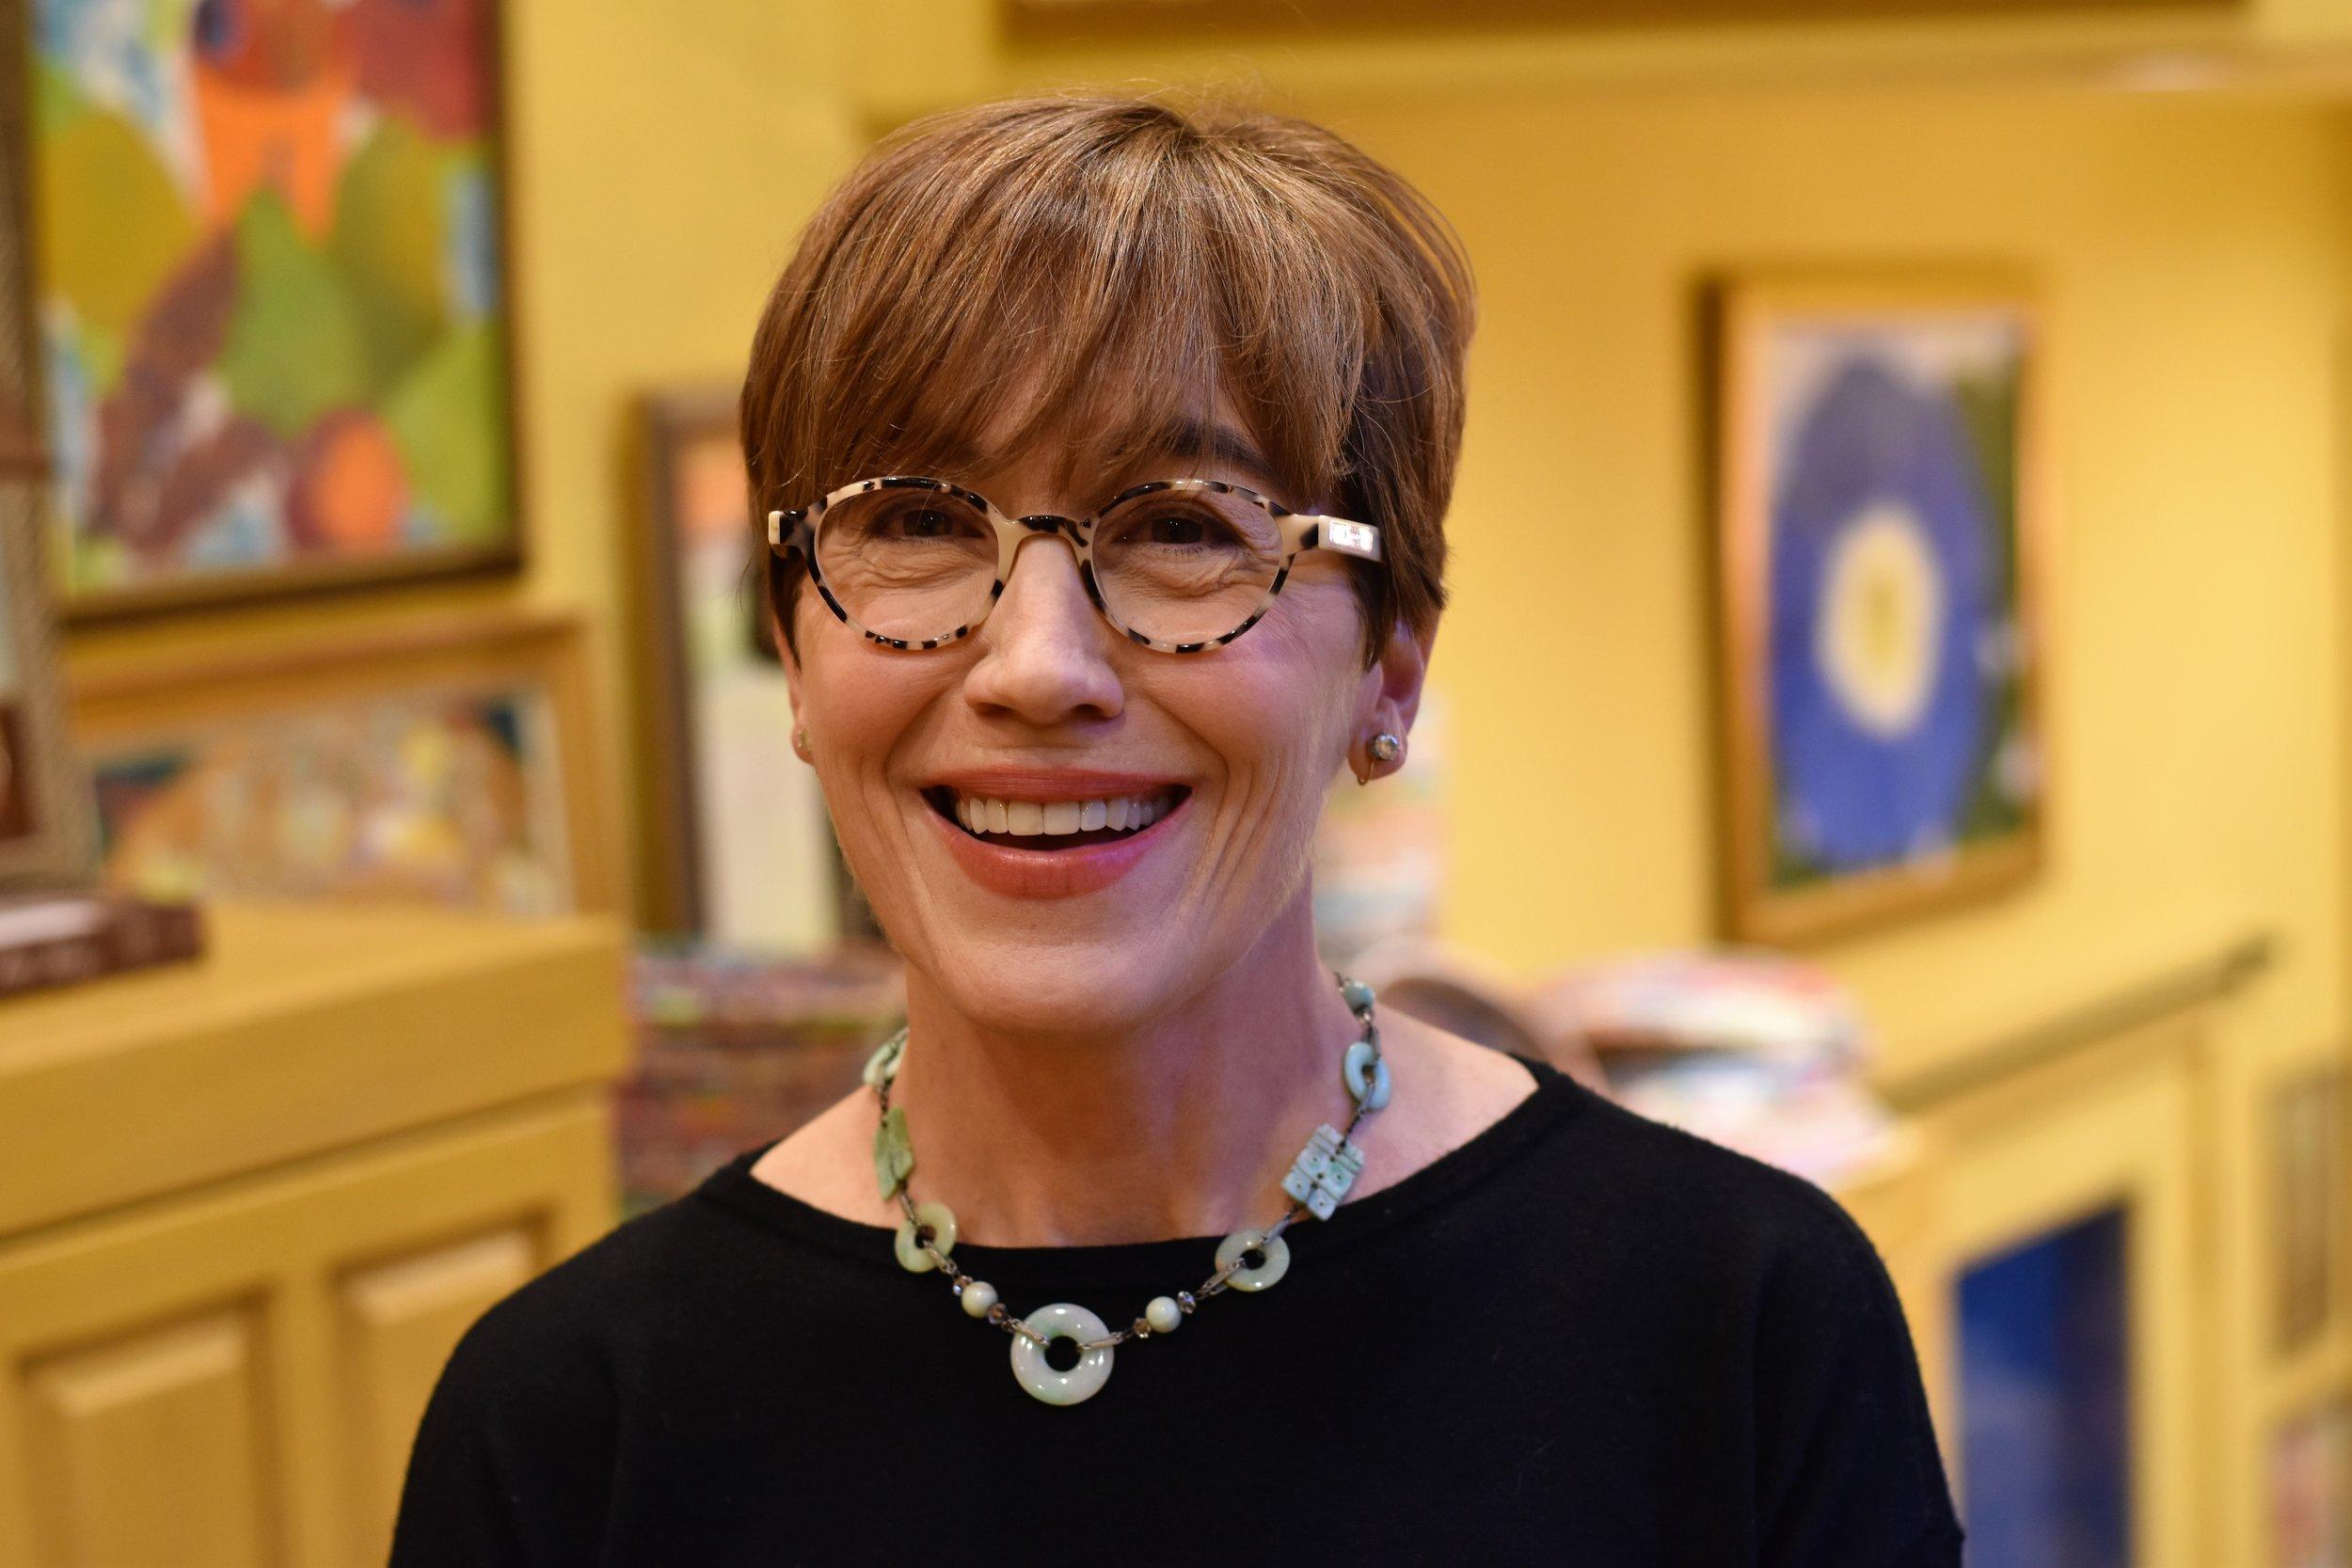 Susan Boe, maker behind Boe Bowls